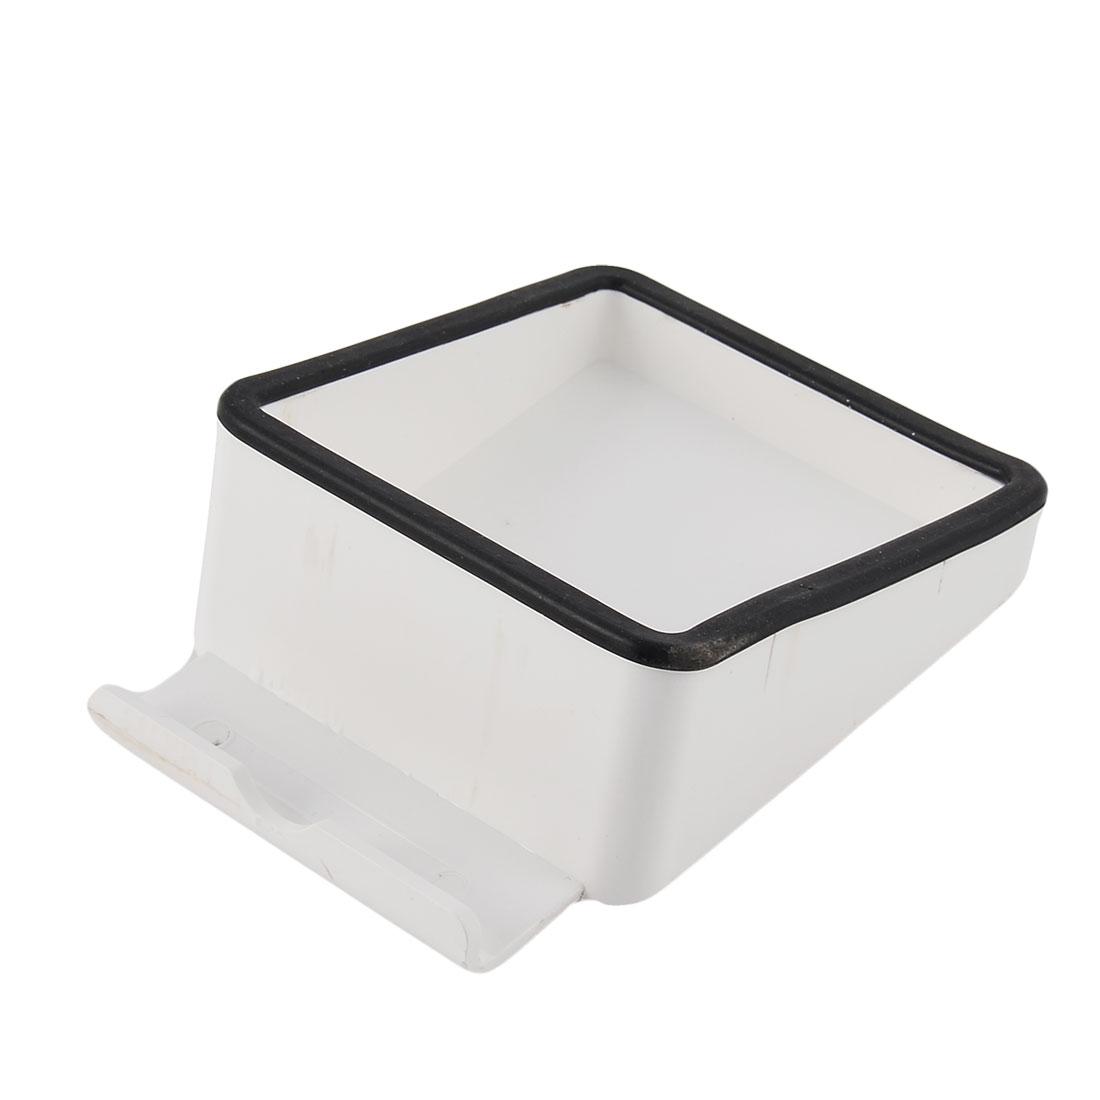 Plastic Folding Desk Desktop Stand Holder Stander Support for MP4 Universal Cell Phone